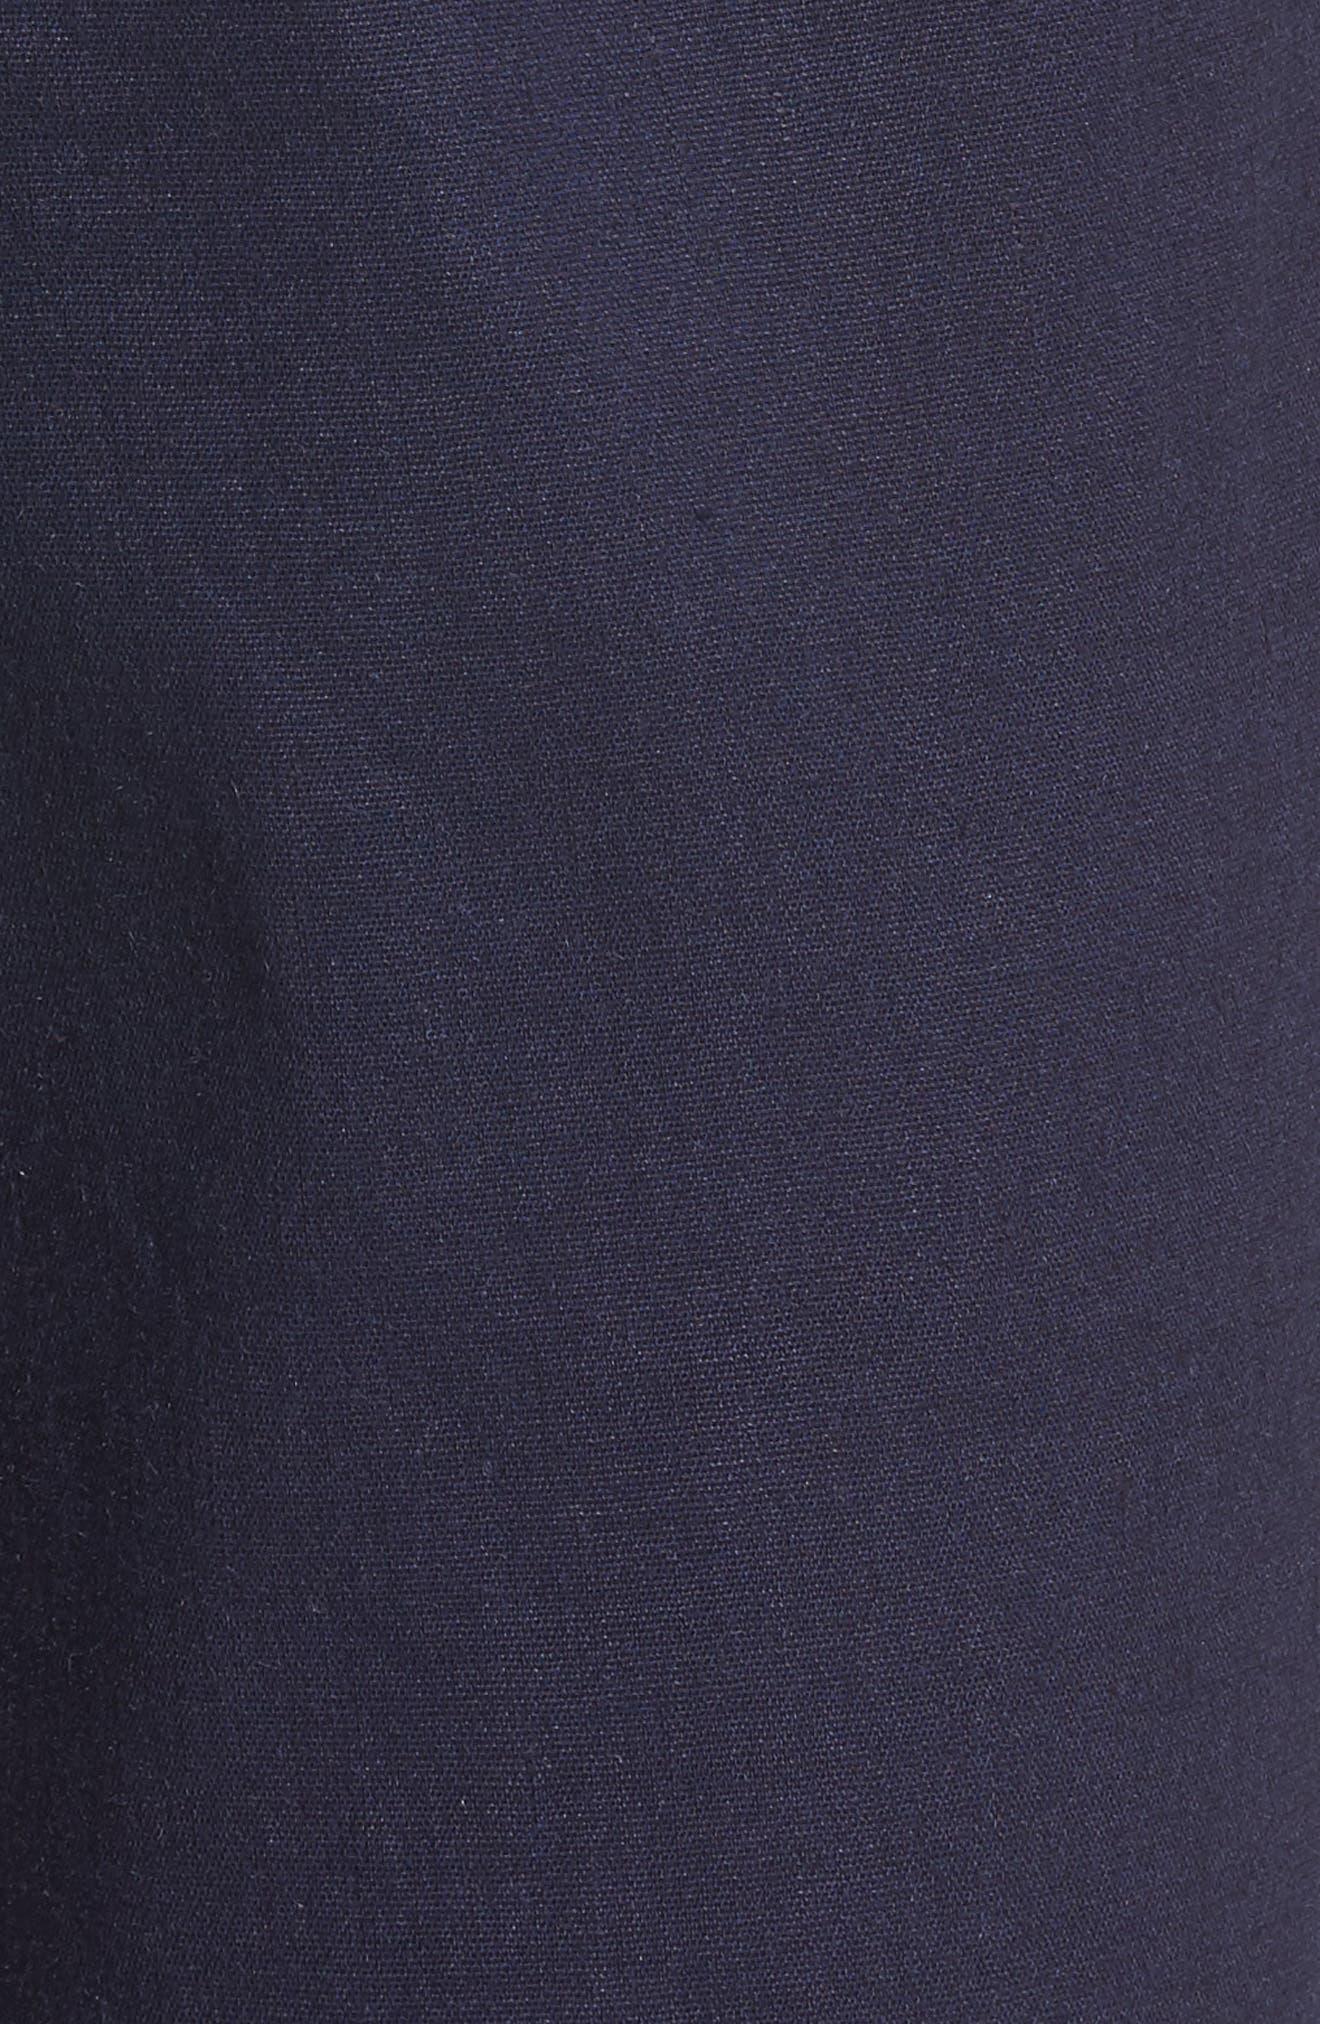 Pleat Front Crop Pants,                             Alternate thumbnail 6, color,                             Navy Evening